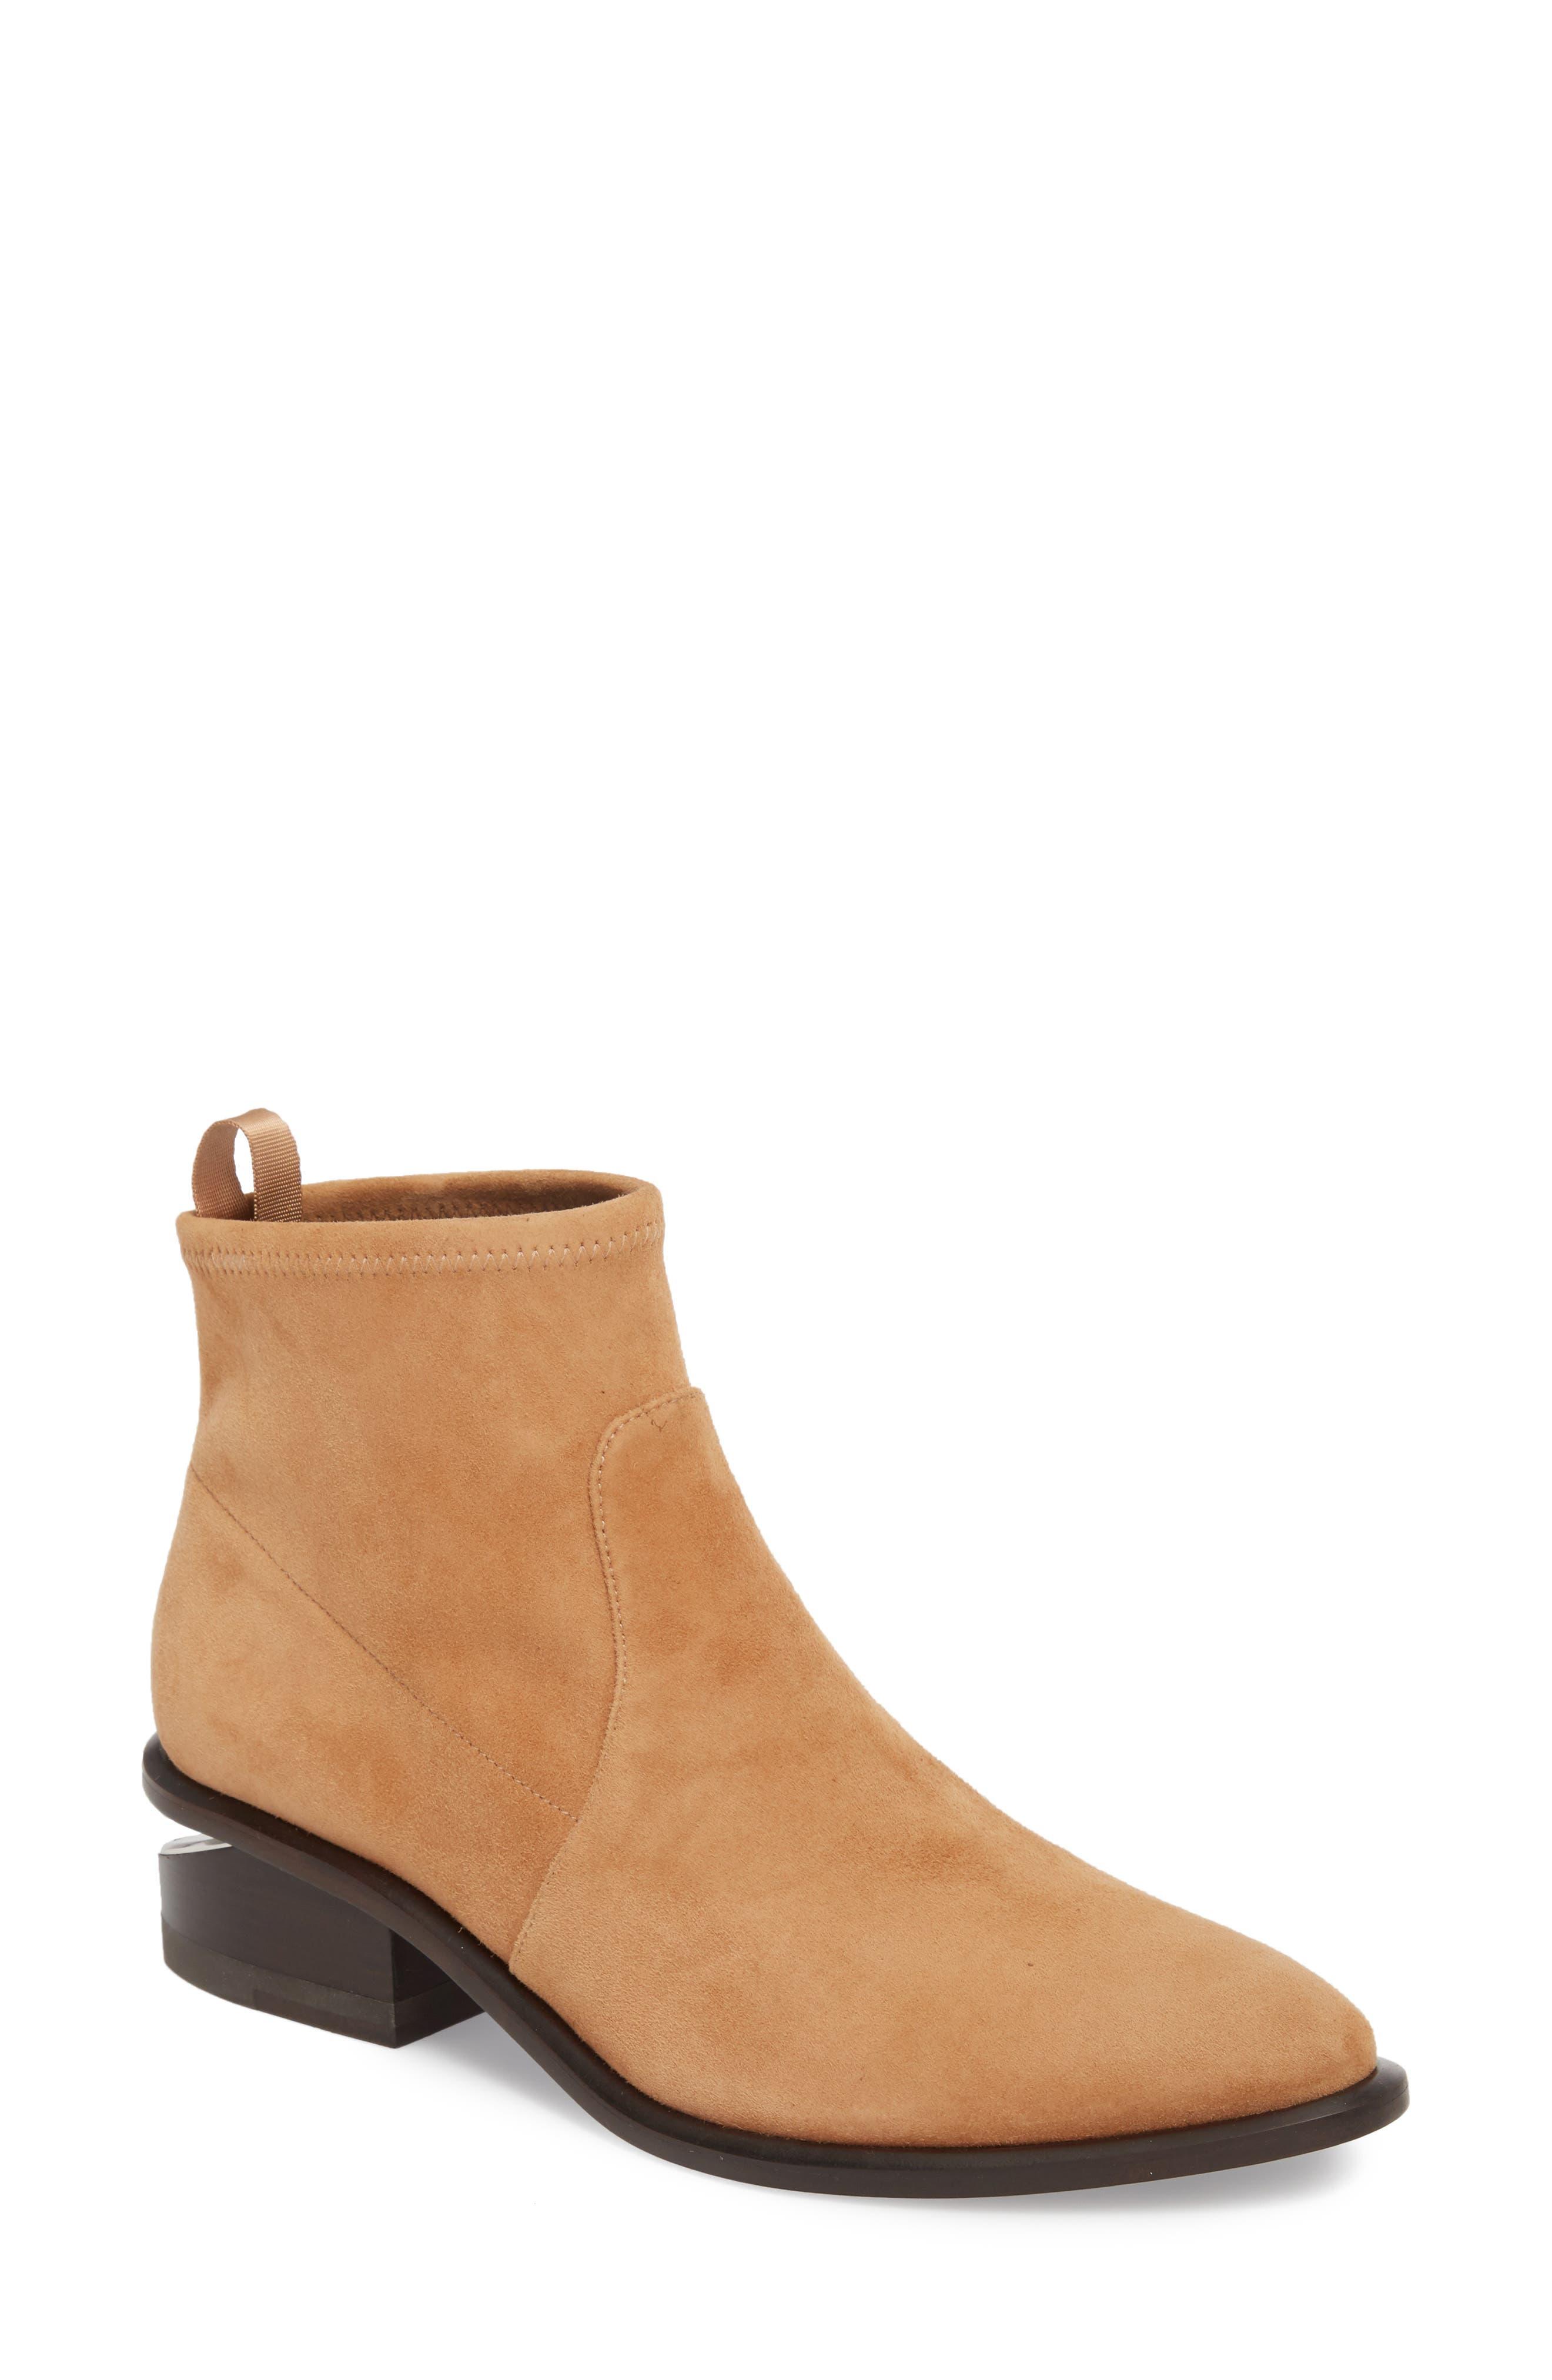 ALEXANDER WANG Kori Block Heel Bootie, Main, color, CLAY